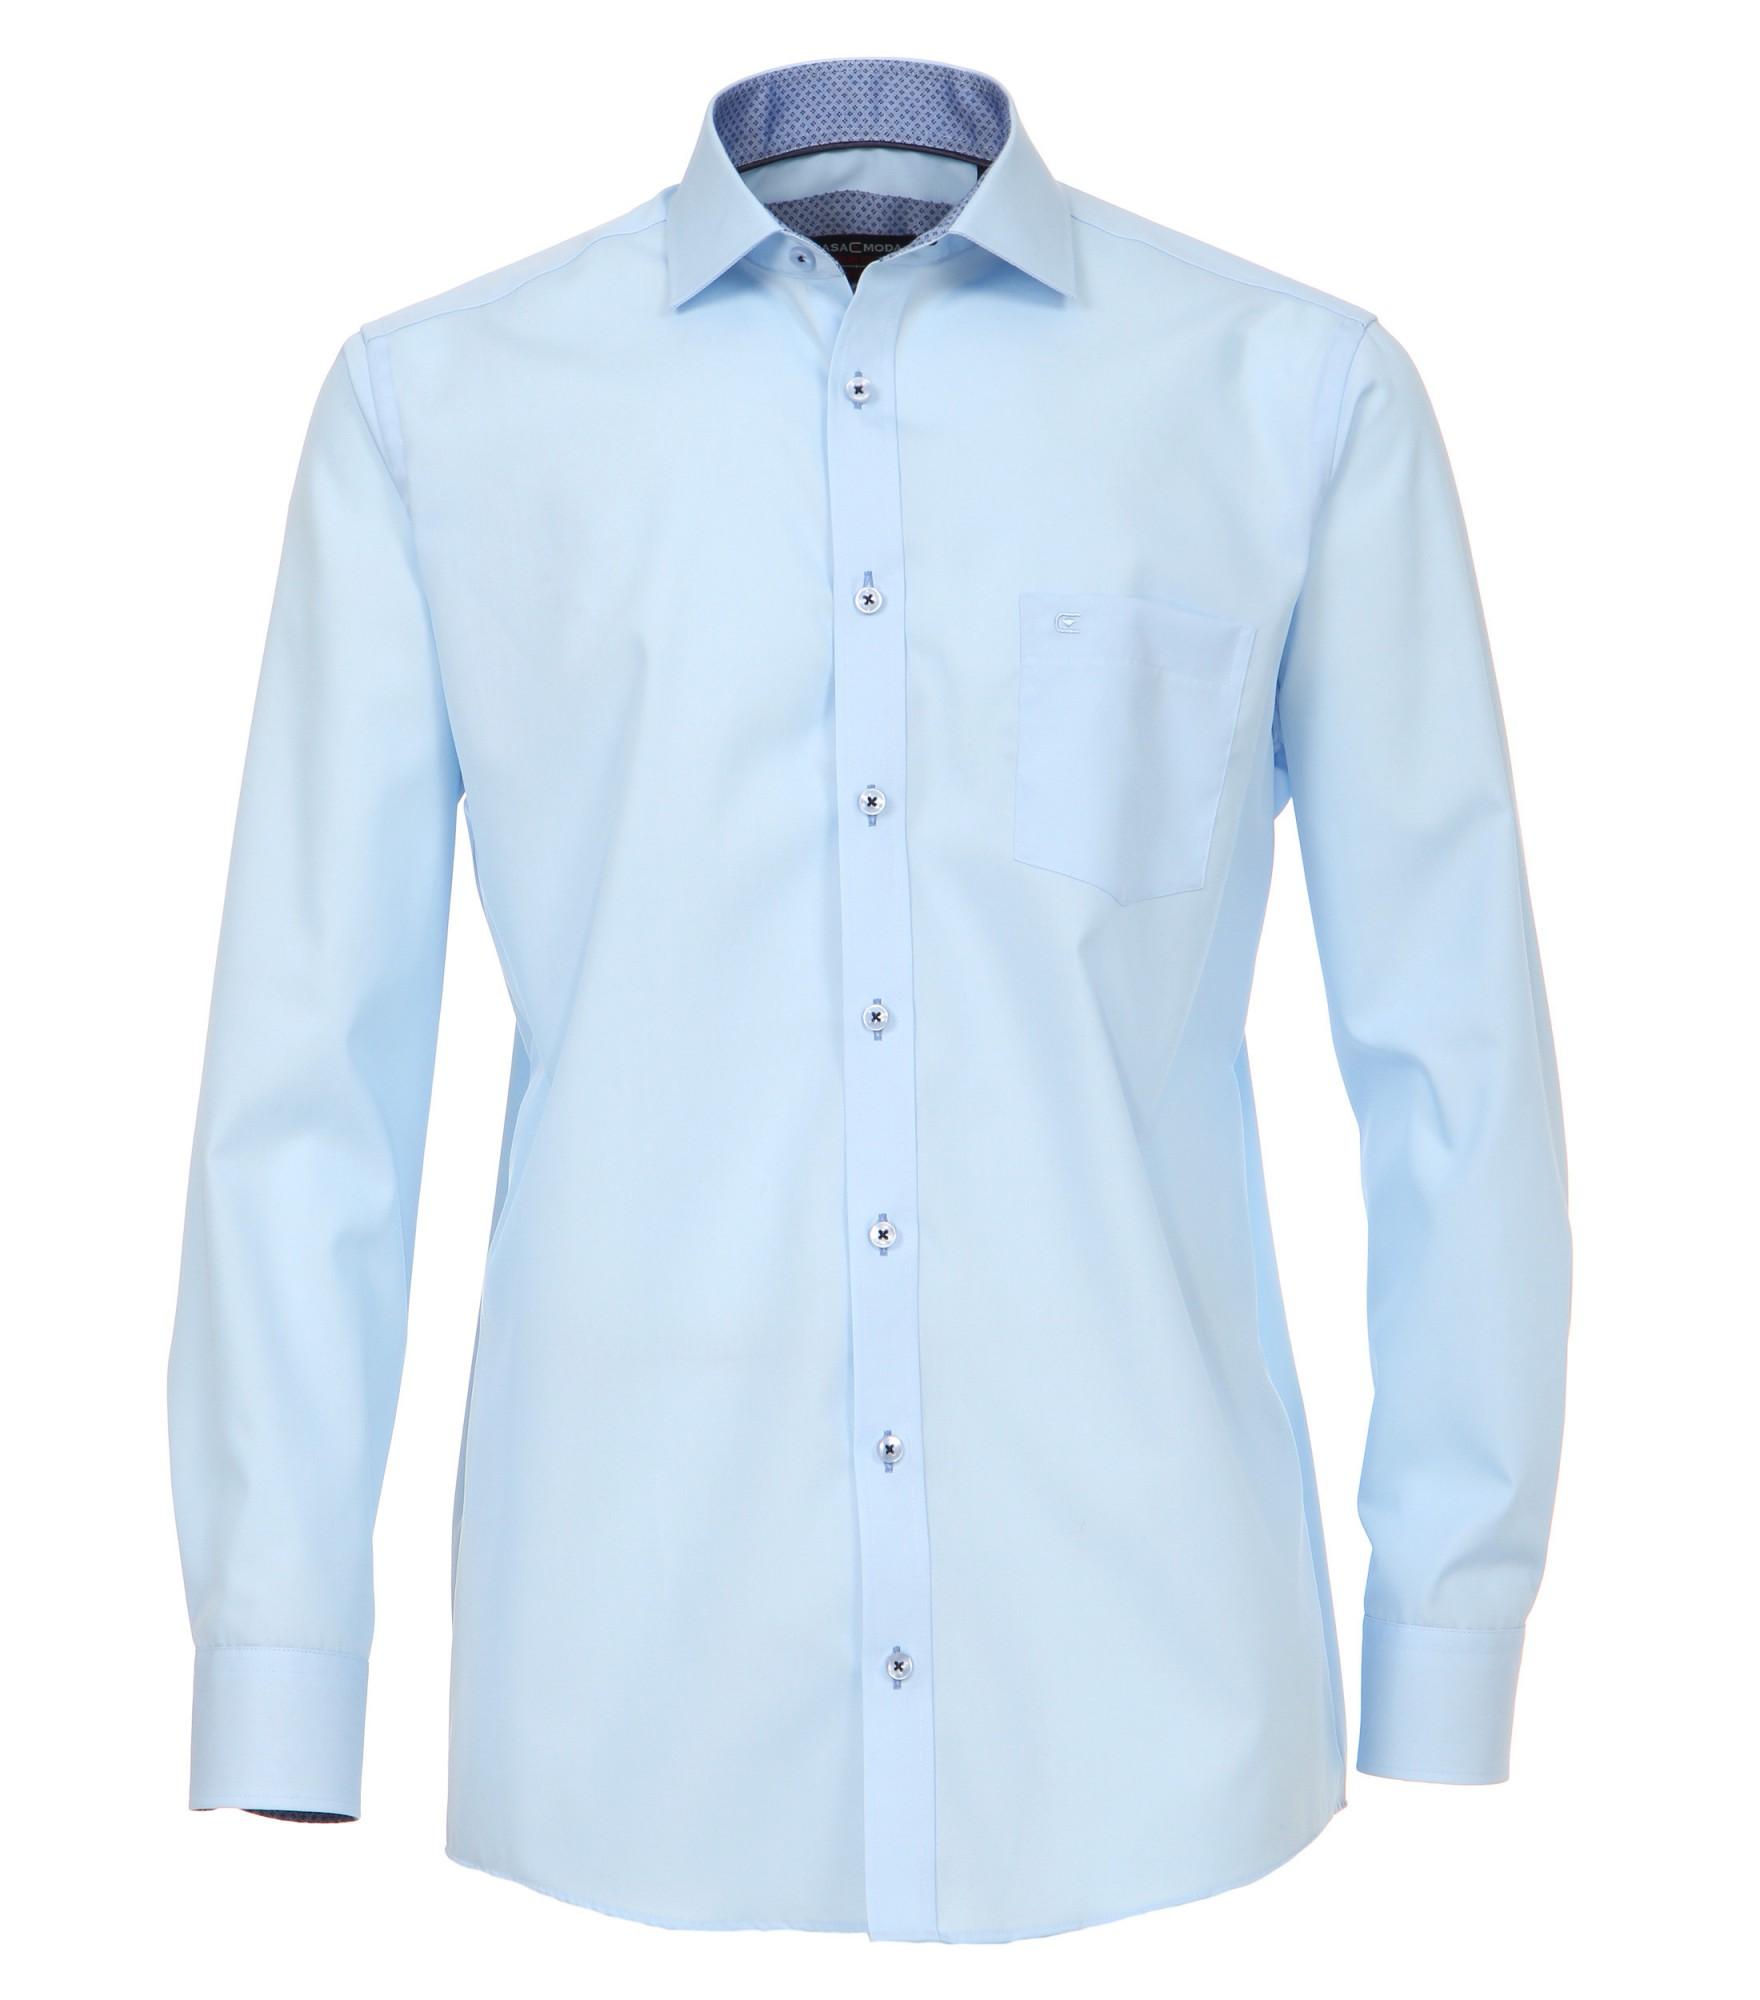 Overhemd Extra Lange Mouw.Overhemd Casa Moda 72cm Extra Lange Mouw Blauw Strijkvrij